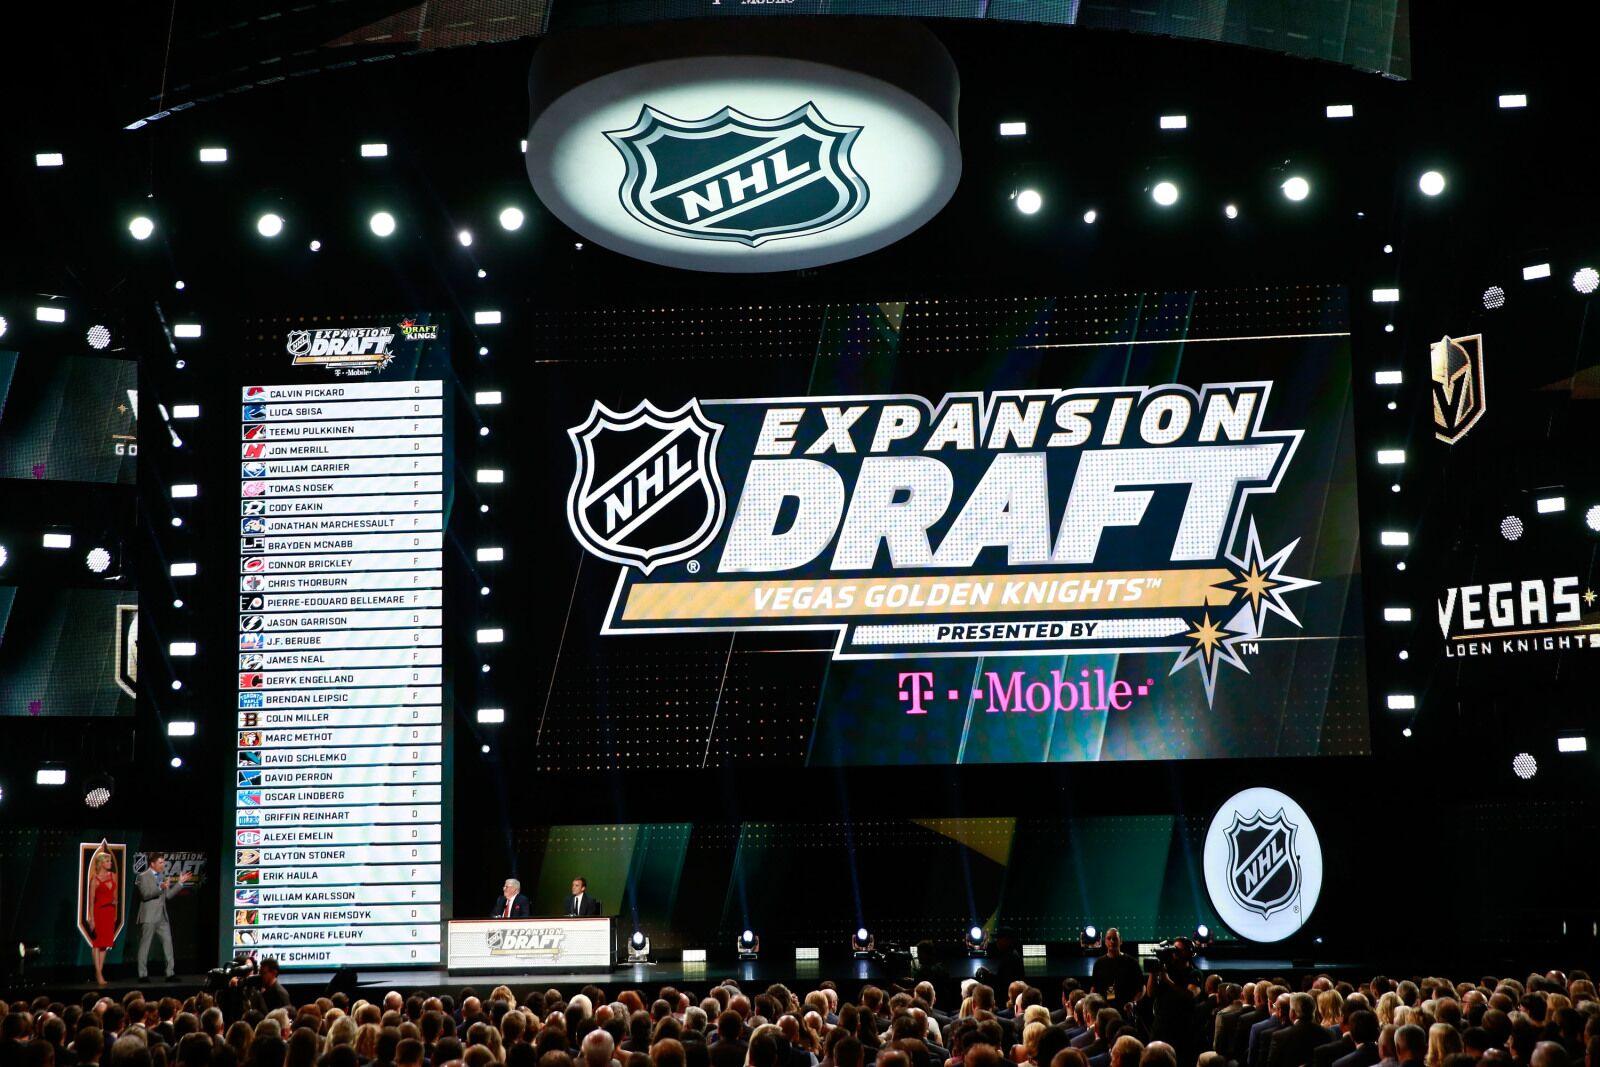 nhl draft ranking each team s expansion decision